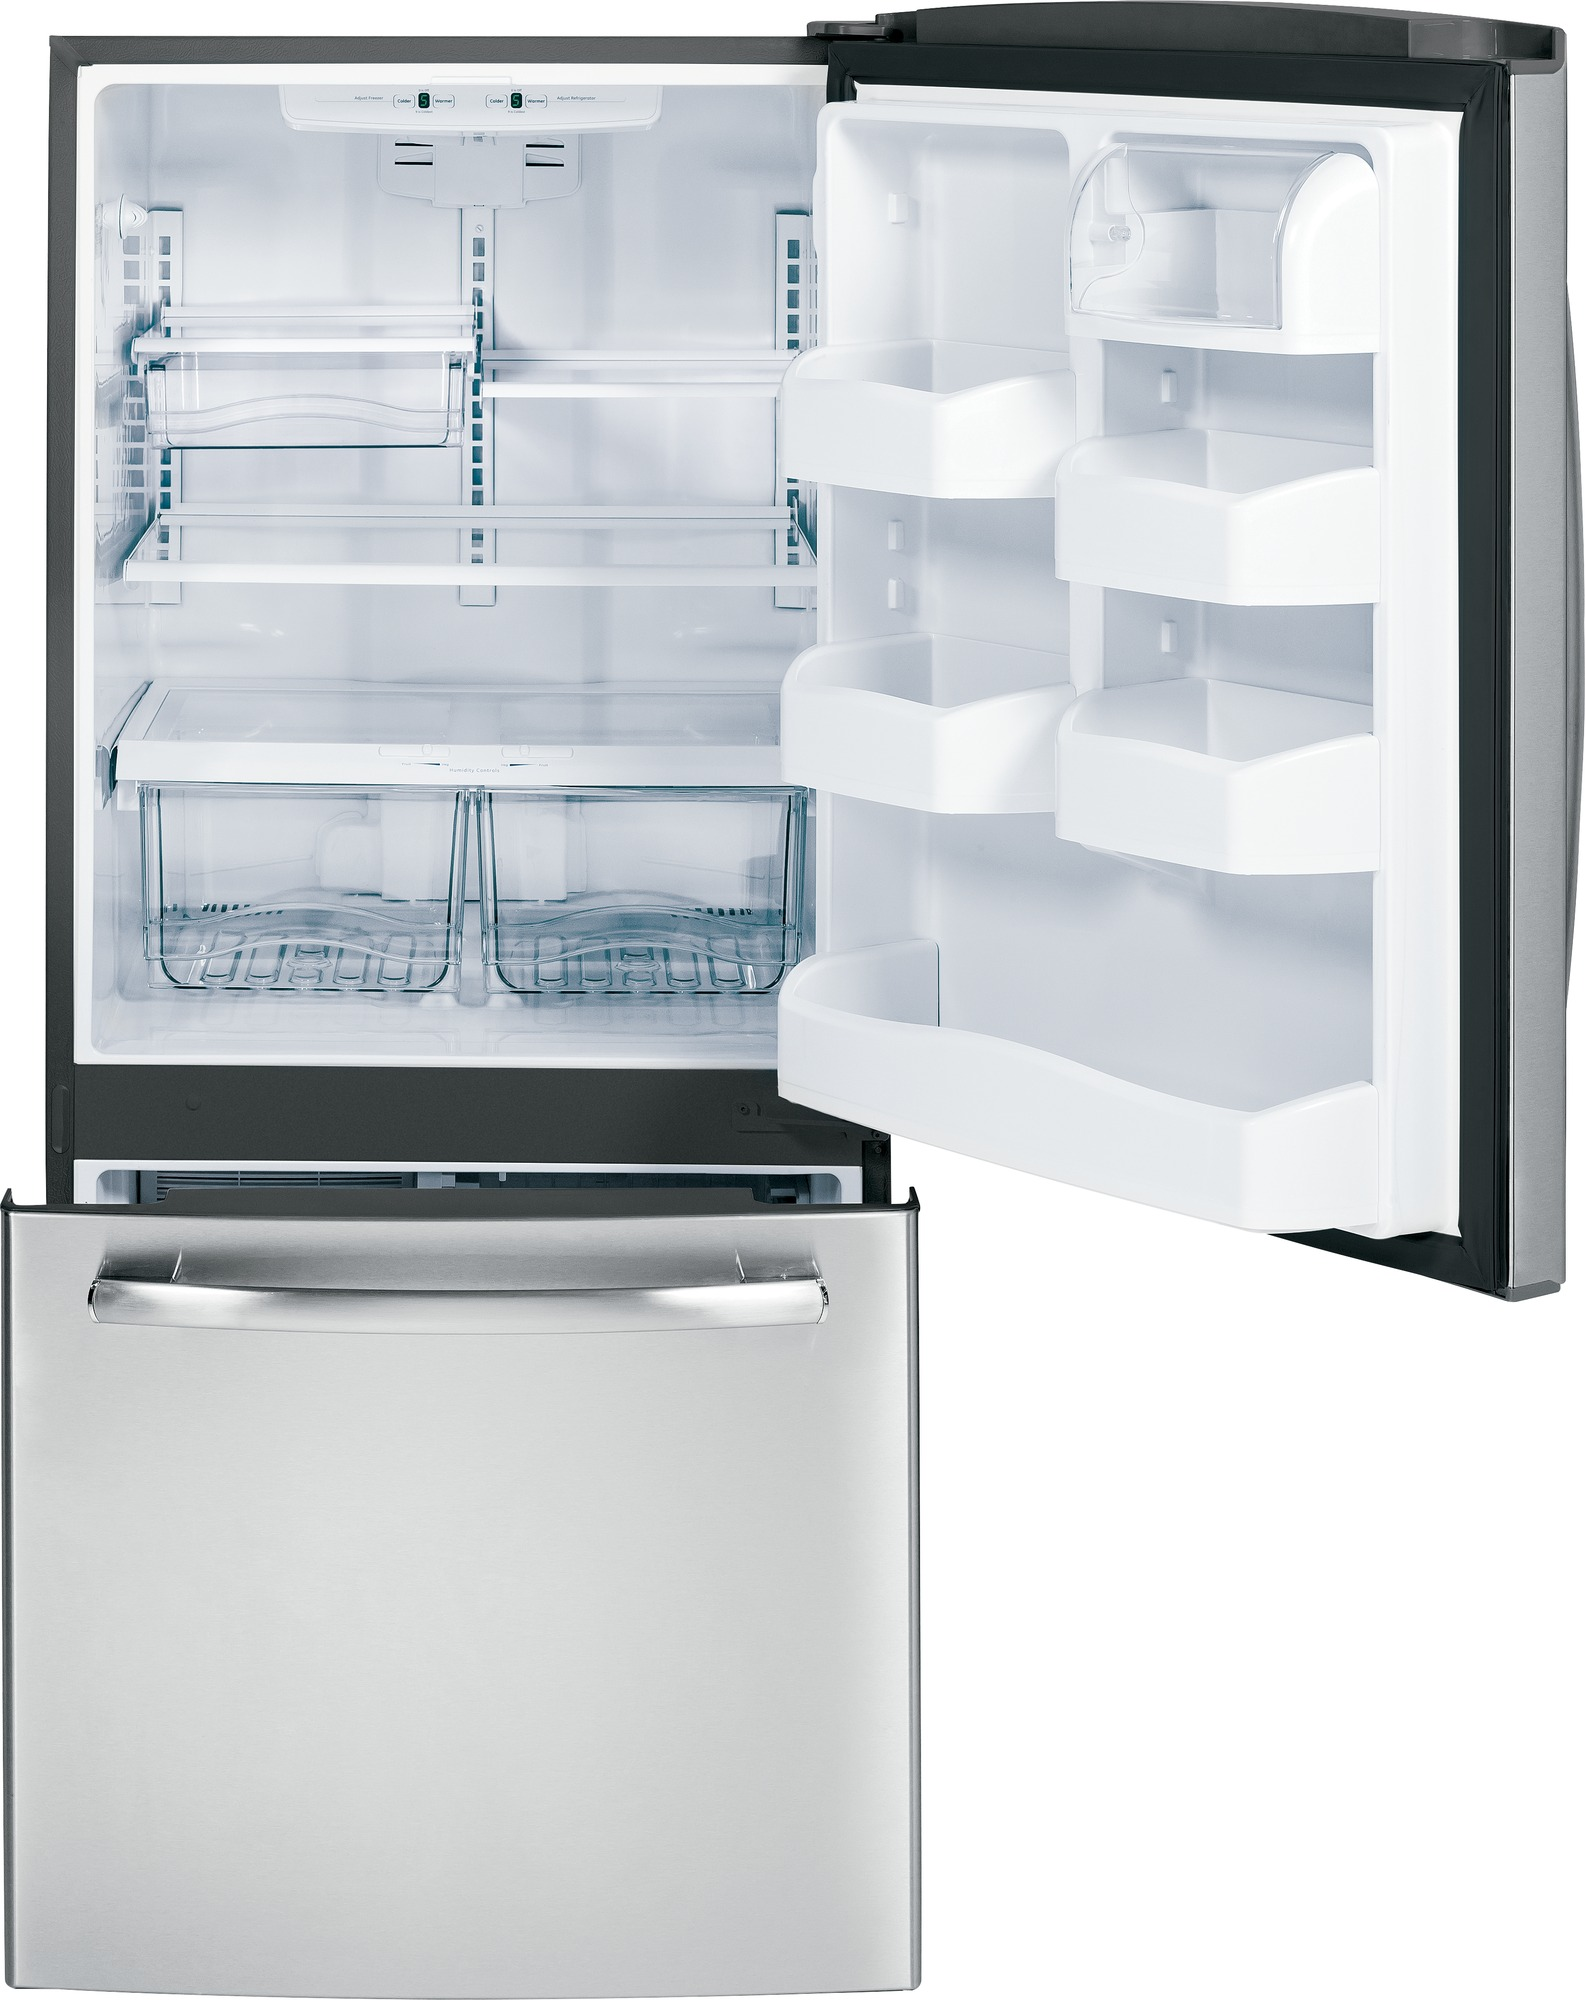 GE Appliances 20.3 cu. ft. Bottom-Freezer Refrigerator - Stainless Steel